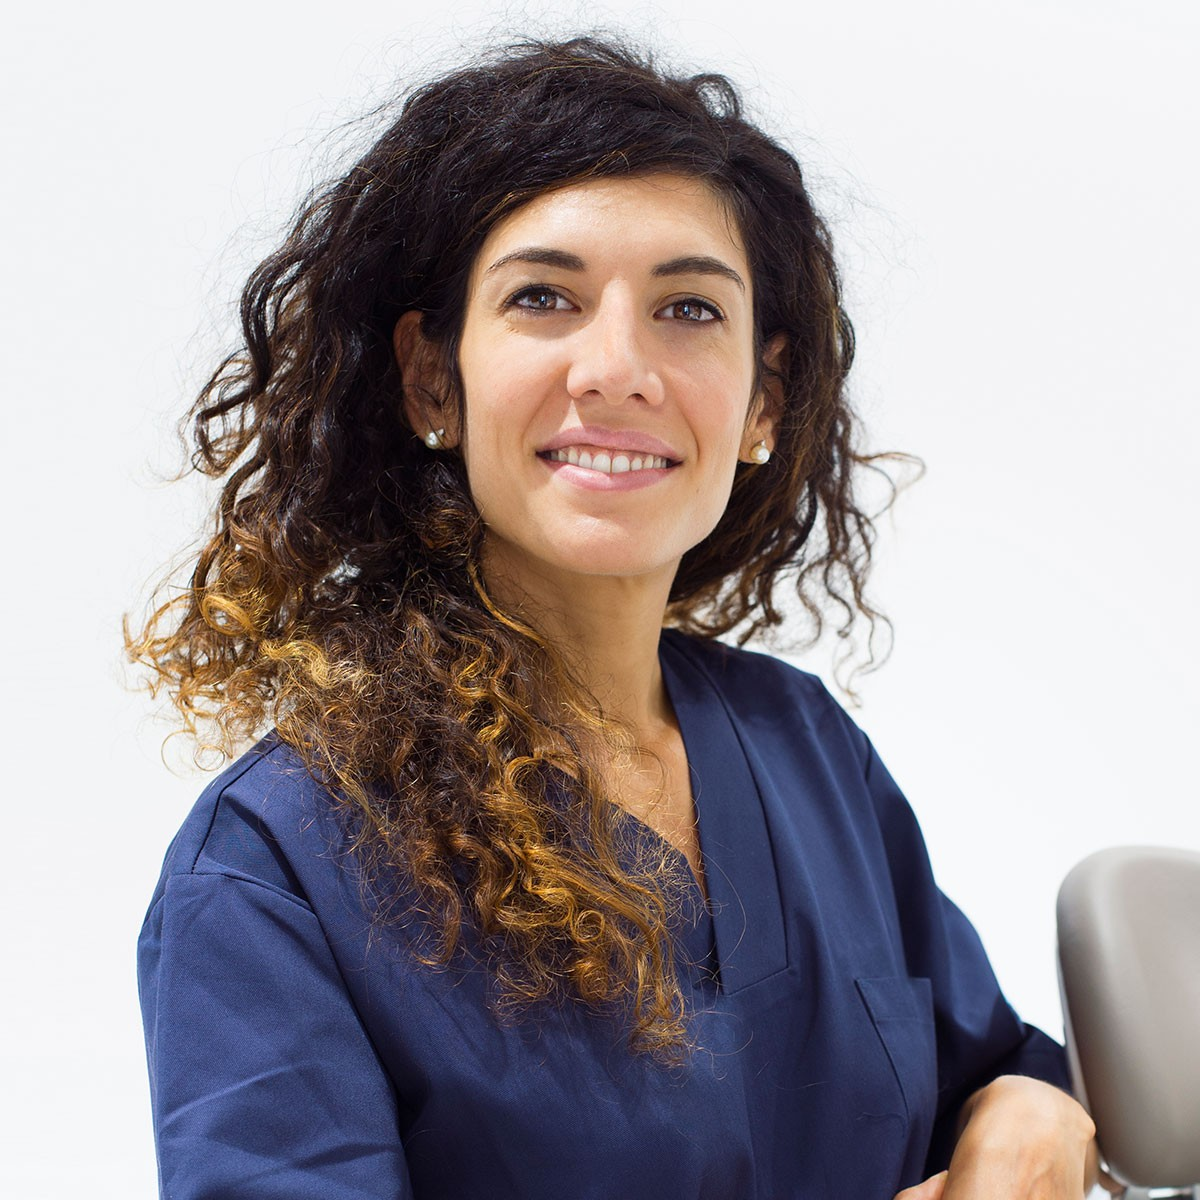 Dra. María Giulia Pezzola - Odontóloga especialista en Implantoprótesis